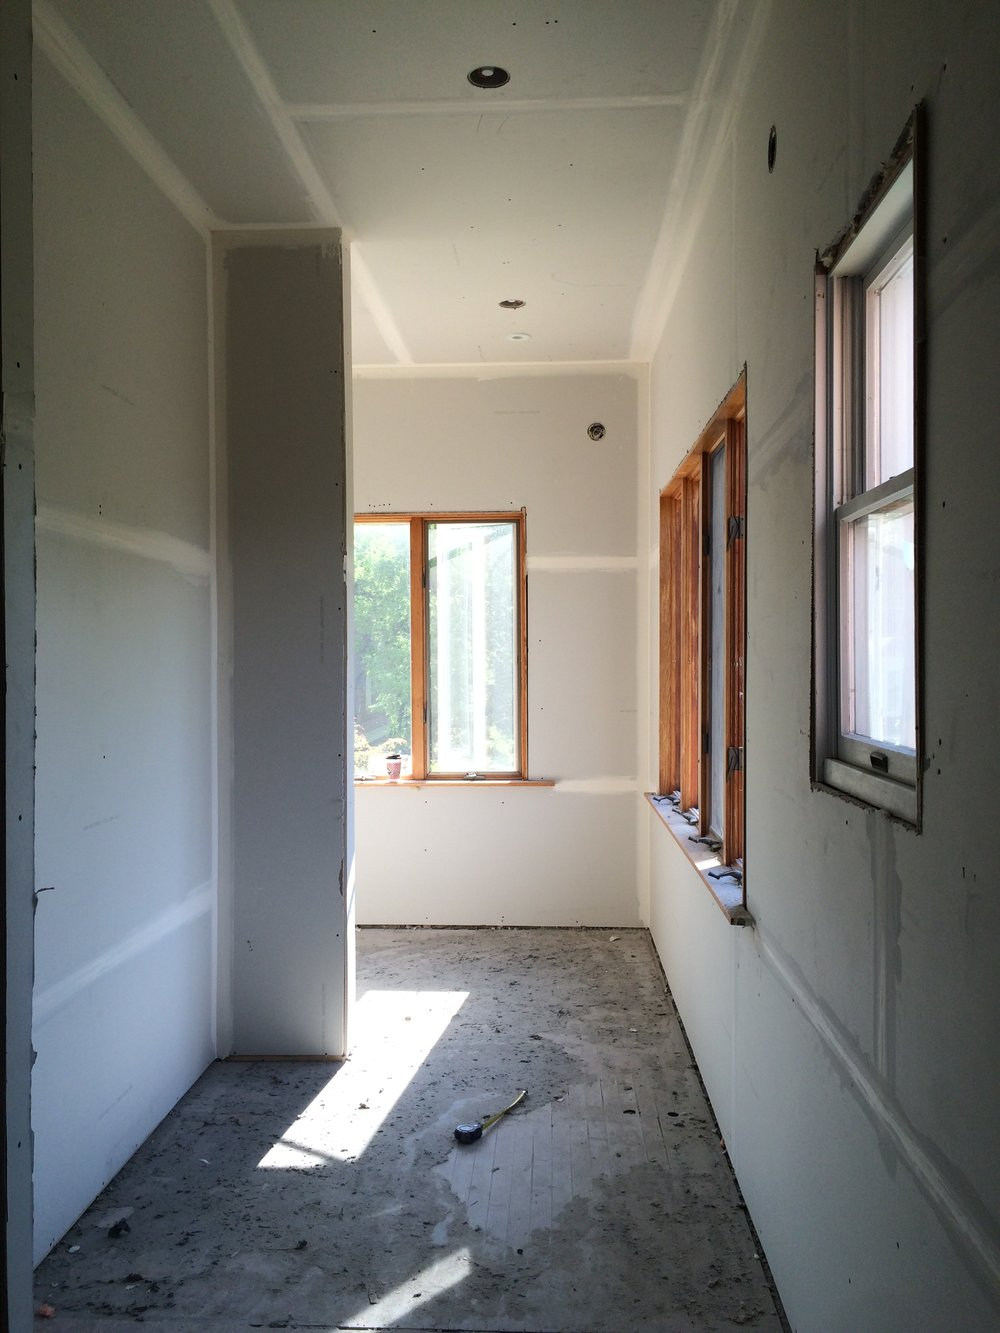 Fuchsia Design What To Expect On Home Renovations Grand Rapids Interior Design Fuchsia Design